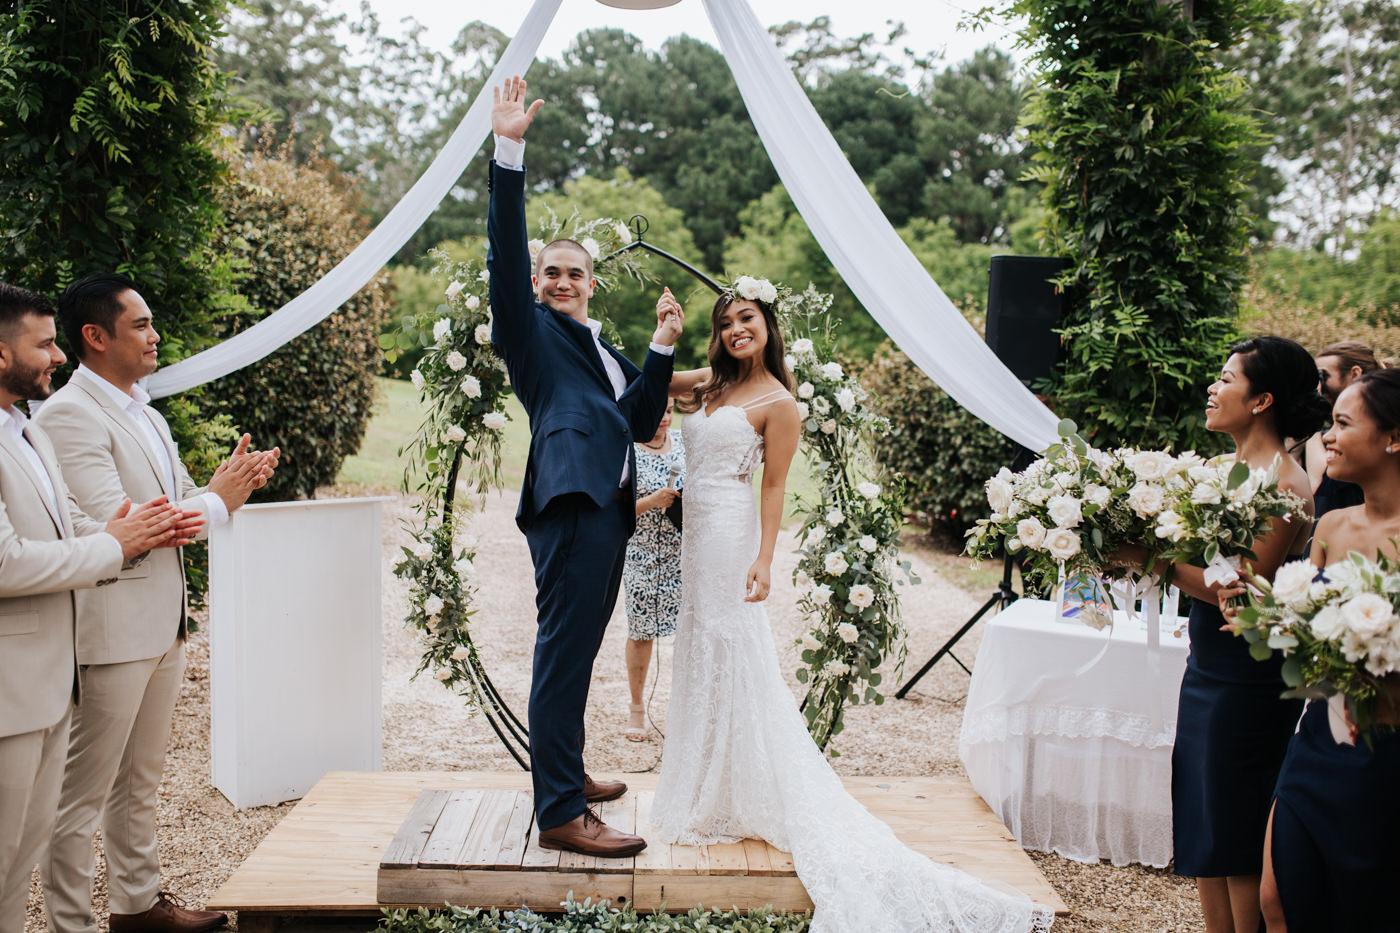 Nick & Vanezza - Fernbank Farm Wedding - Samantha Heather Photography-74.jpg